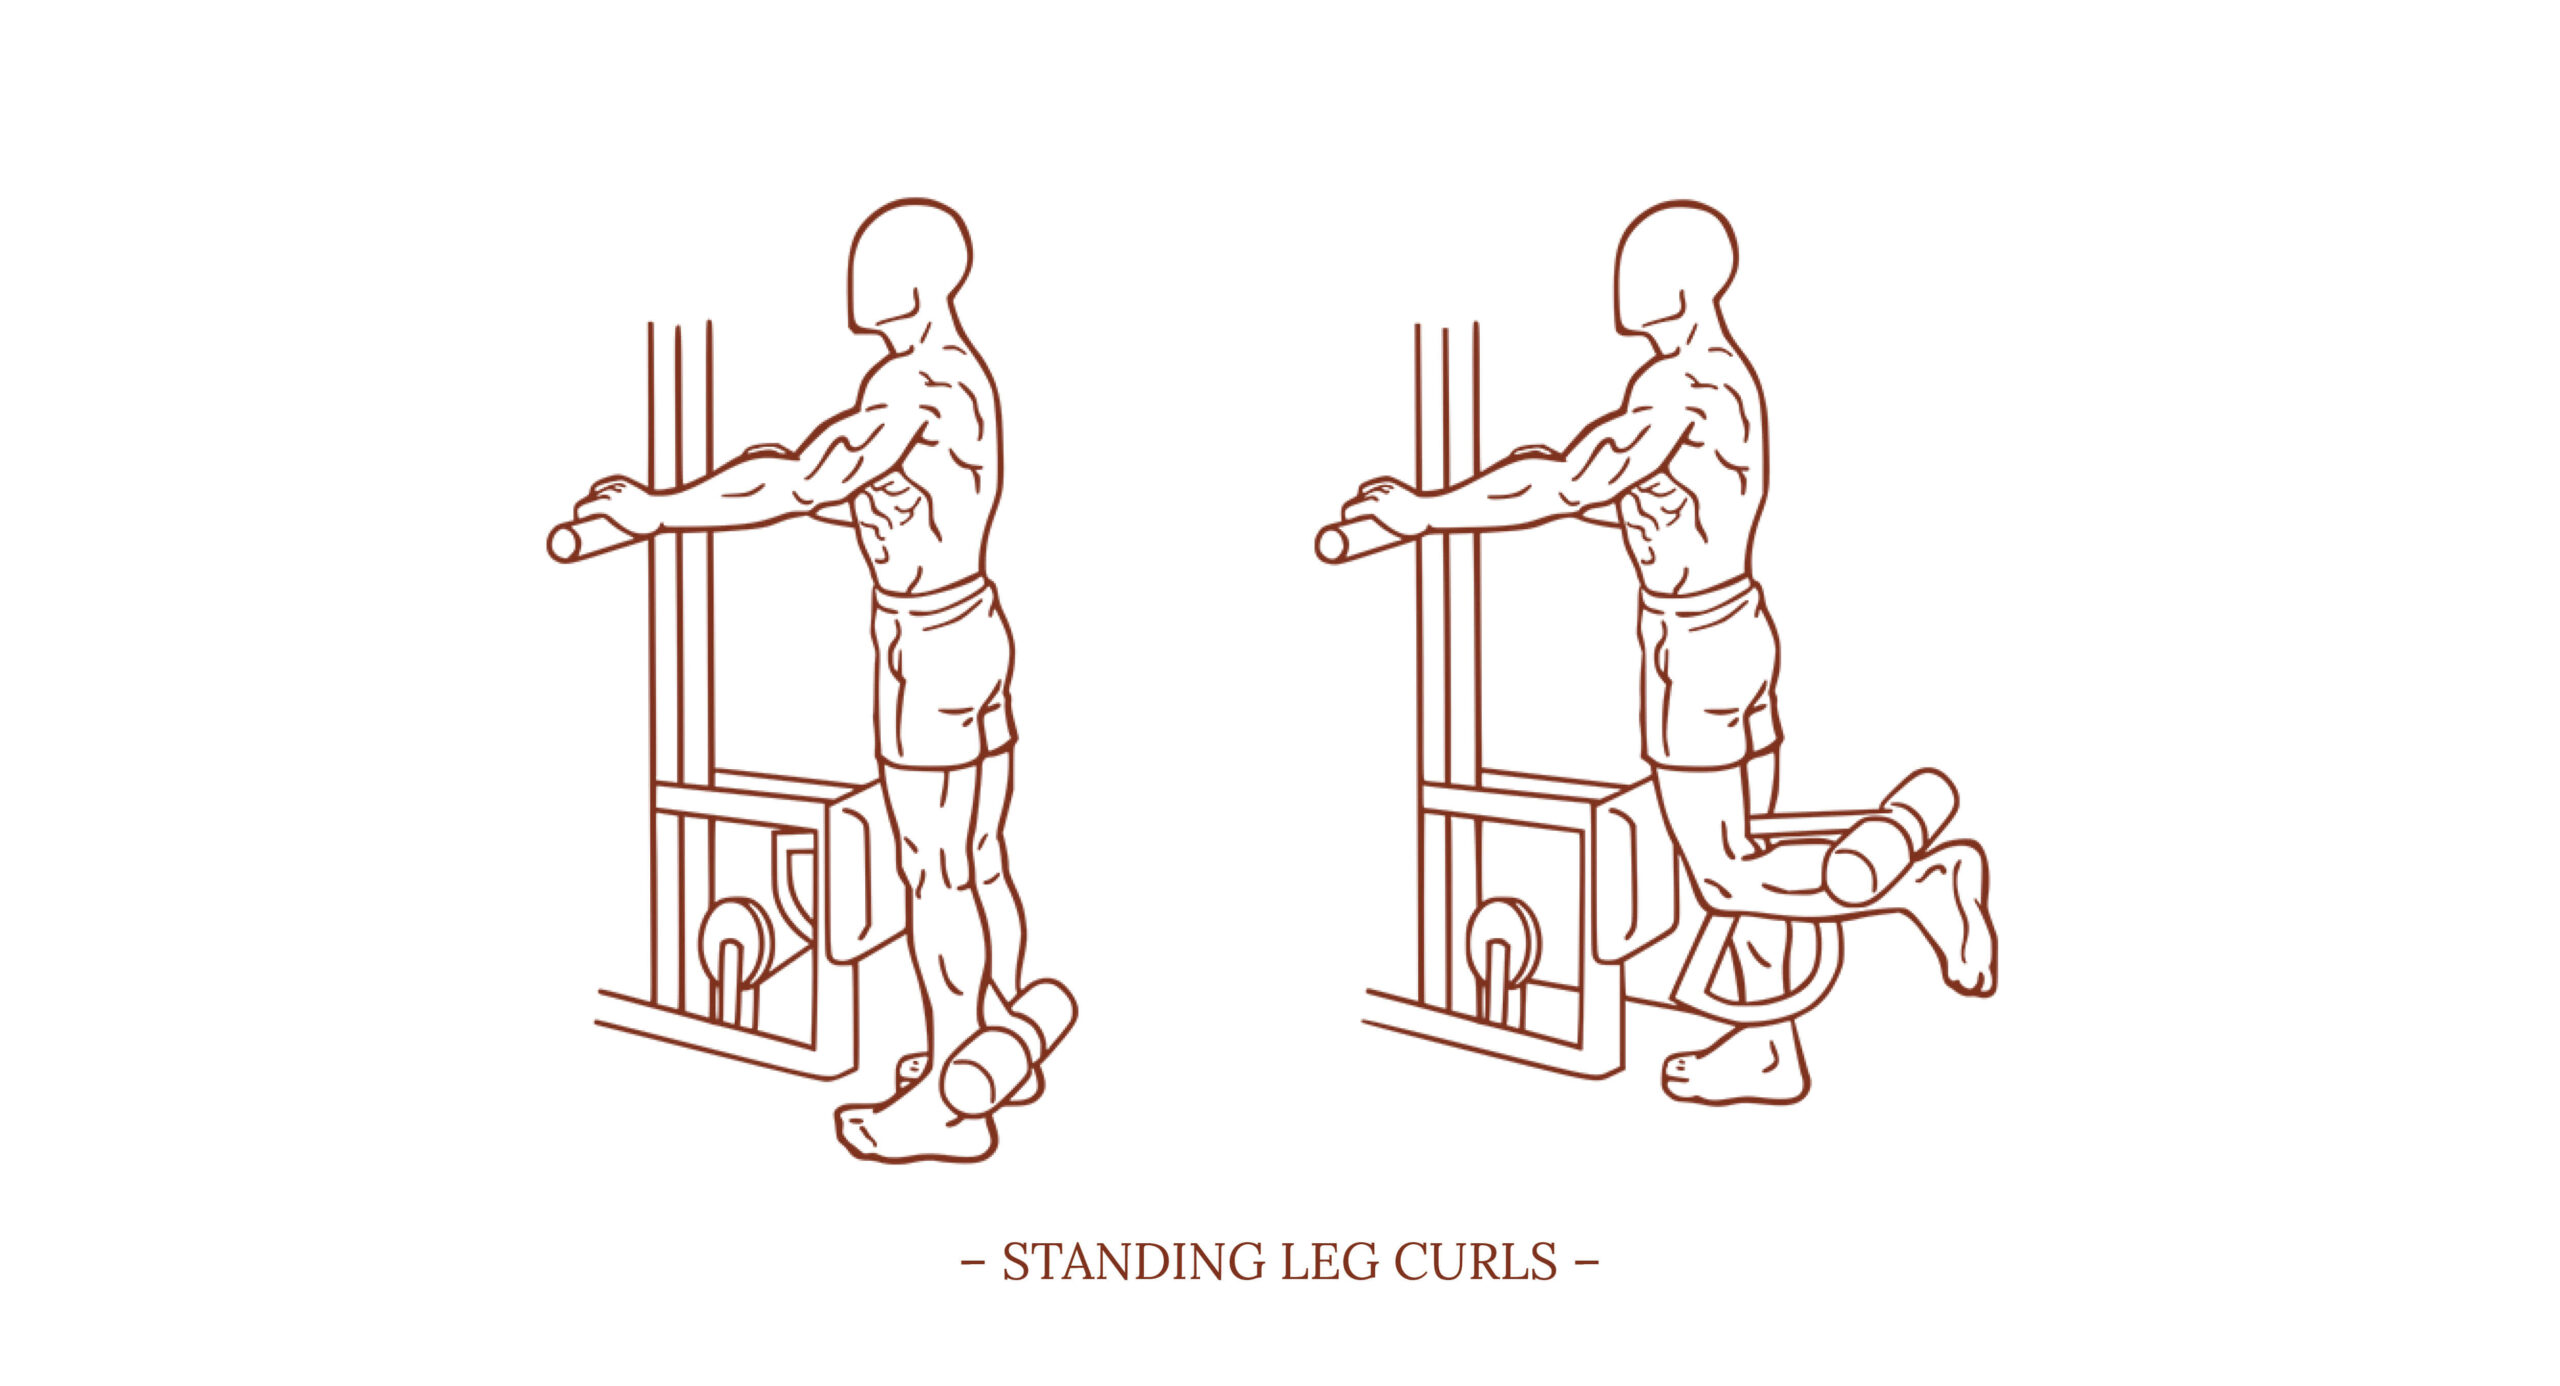 Standing Leg Curls Illustration